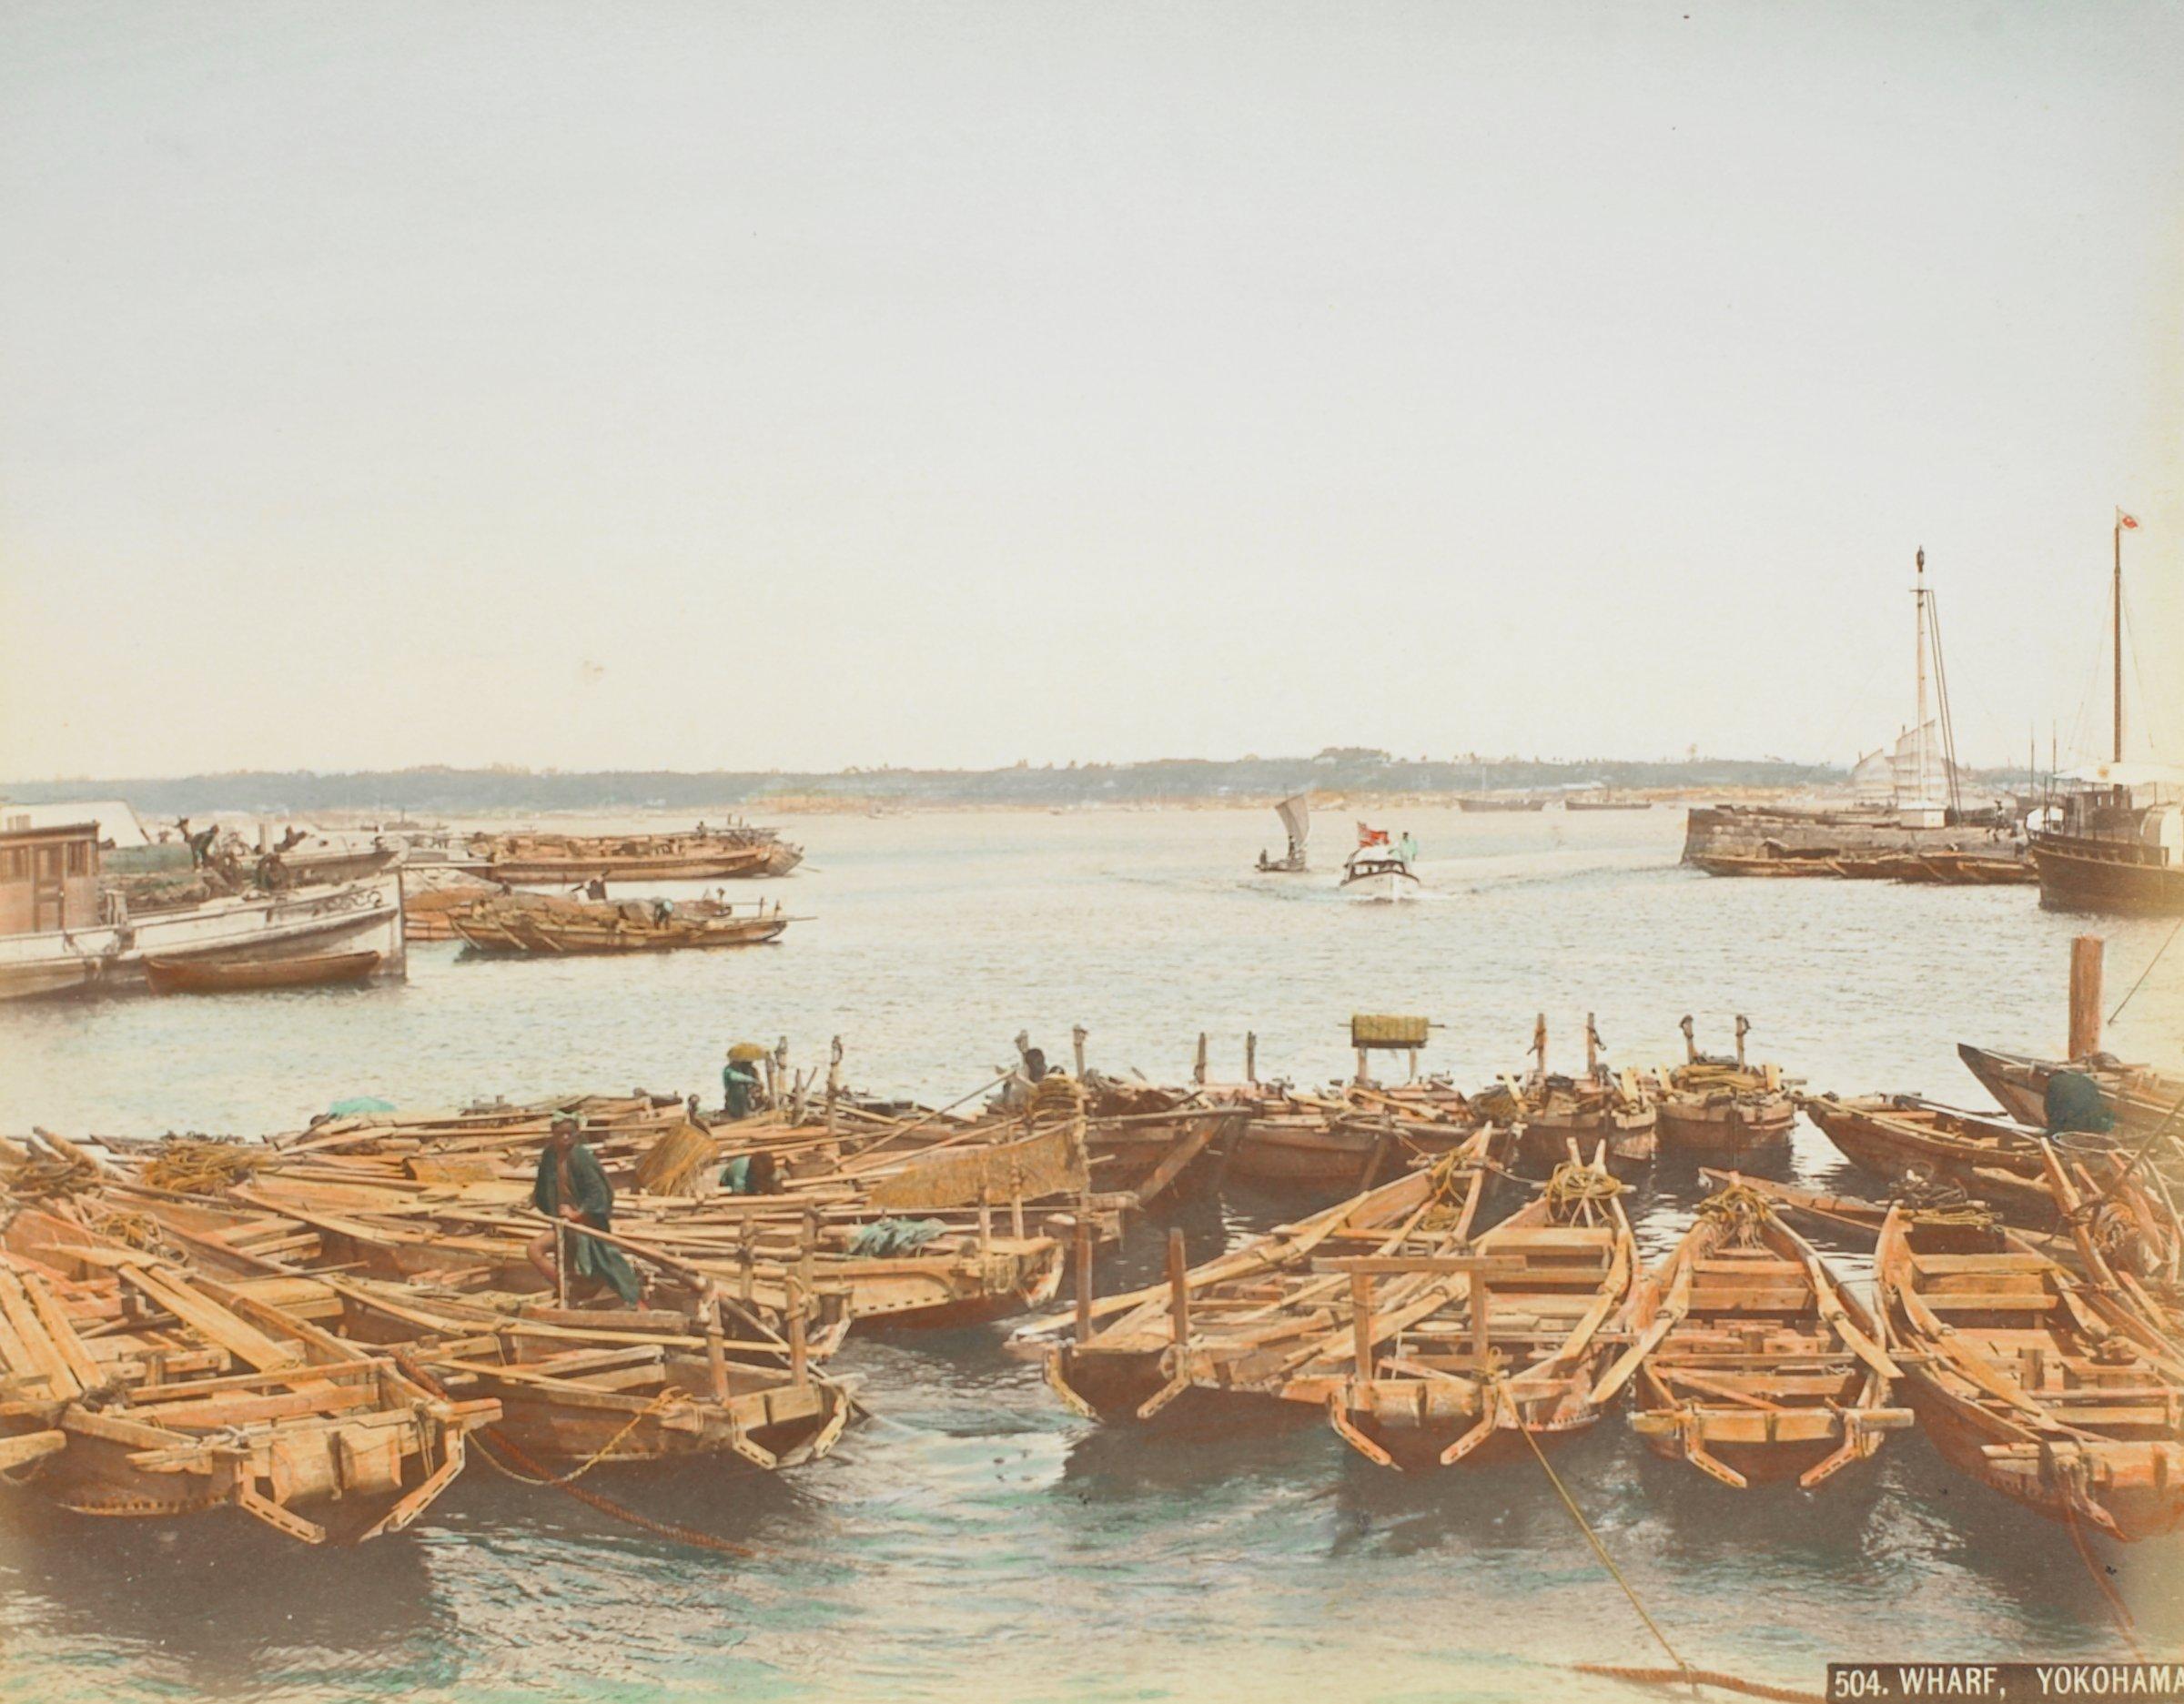 Benten Dori, Yokohama (.24, recto); Wharf, Yokohama (.25, verso), Attributed to Kusakabe Kimbei, hand-colored albumen prints mounted to album page